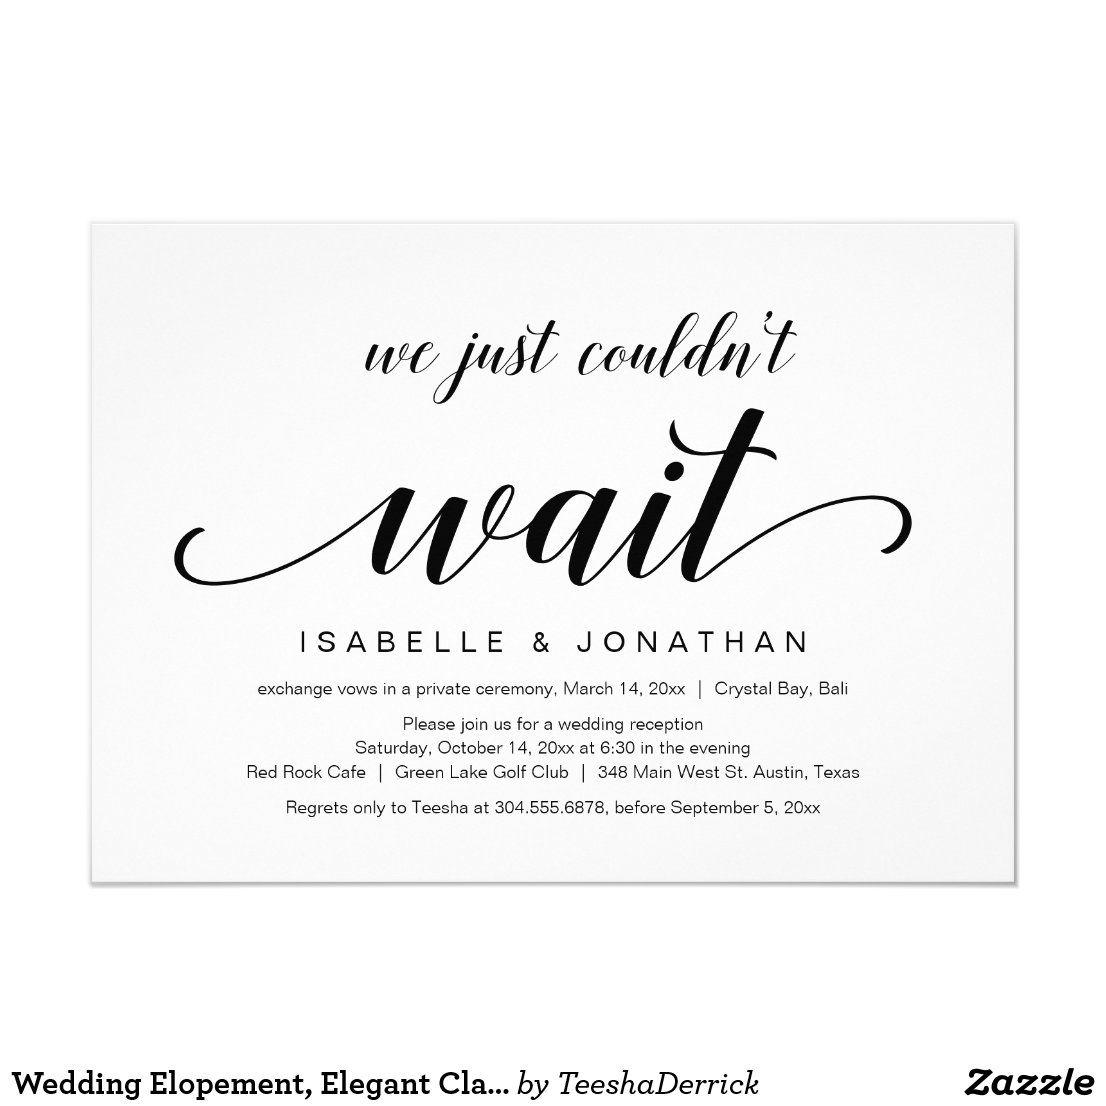 Wedding Elopement, Elegant Classy Black Script Invitation